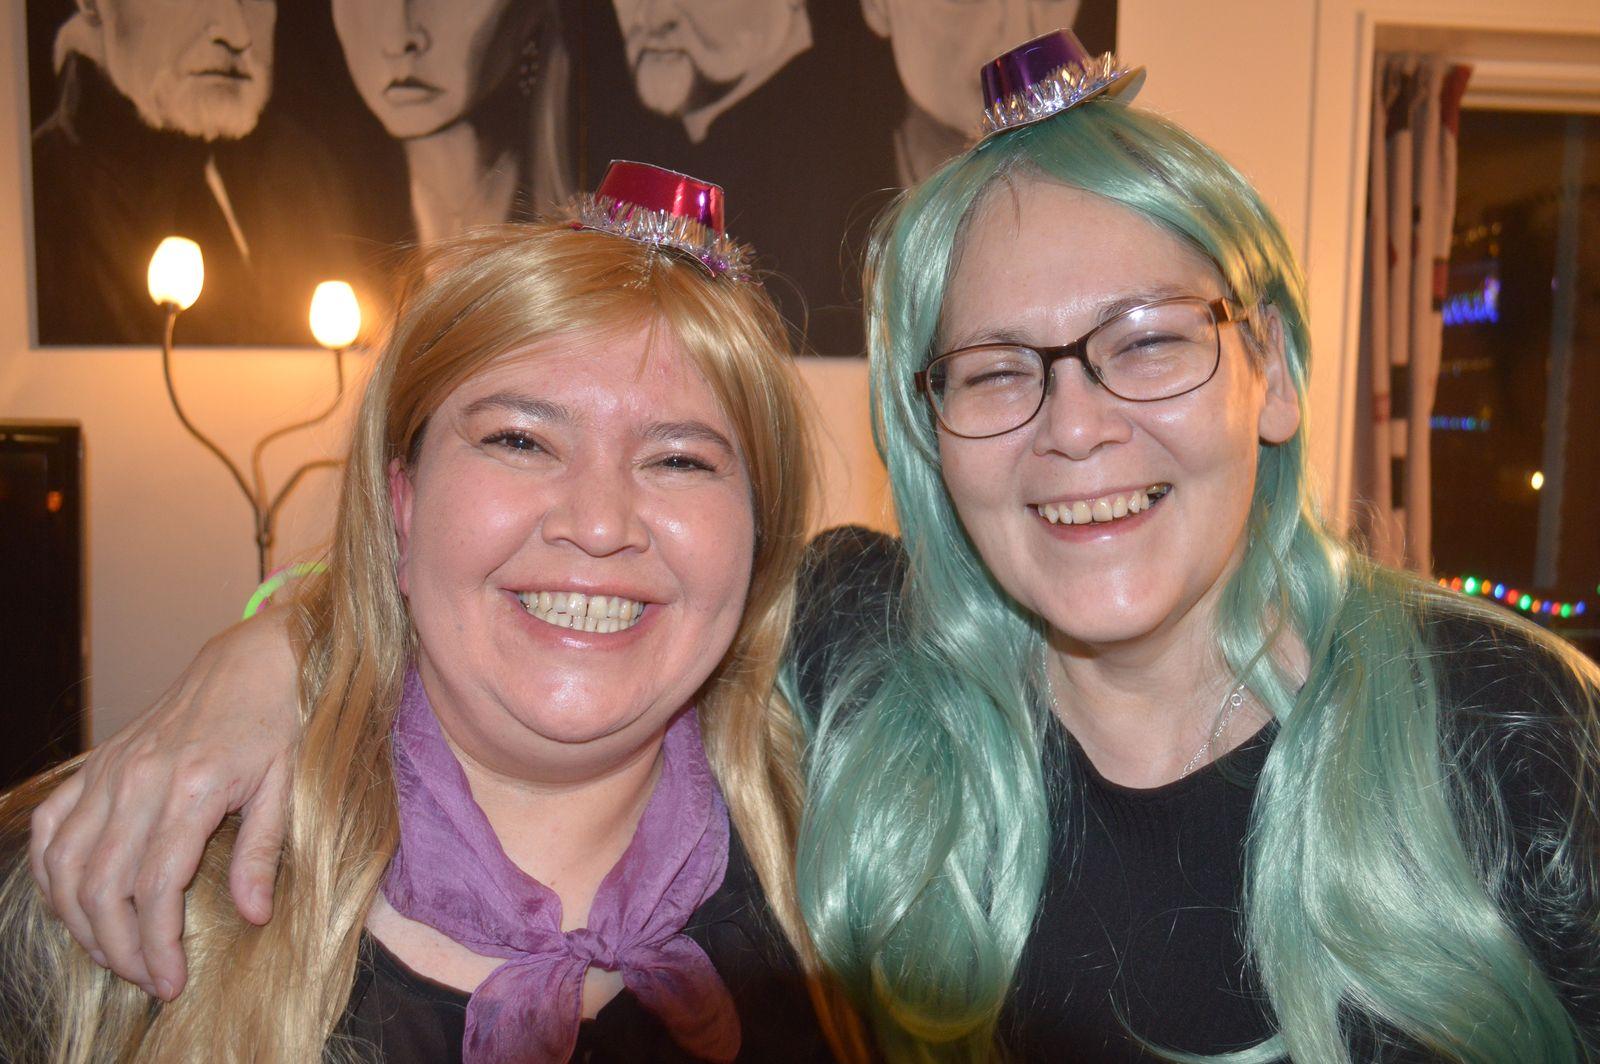 2019-12-31-2215_Anna-Hessler-Labansen-Bedste_1-Juliane-Burmeister